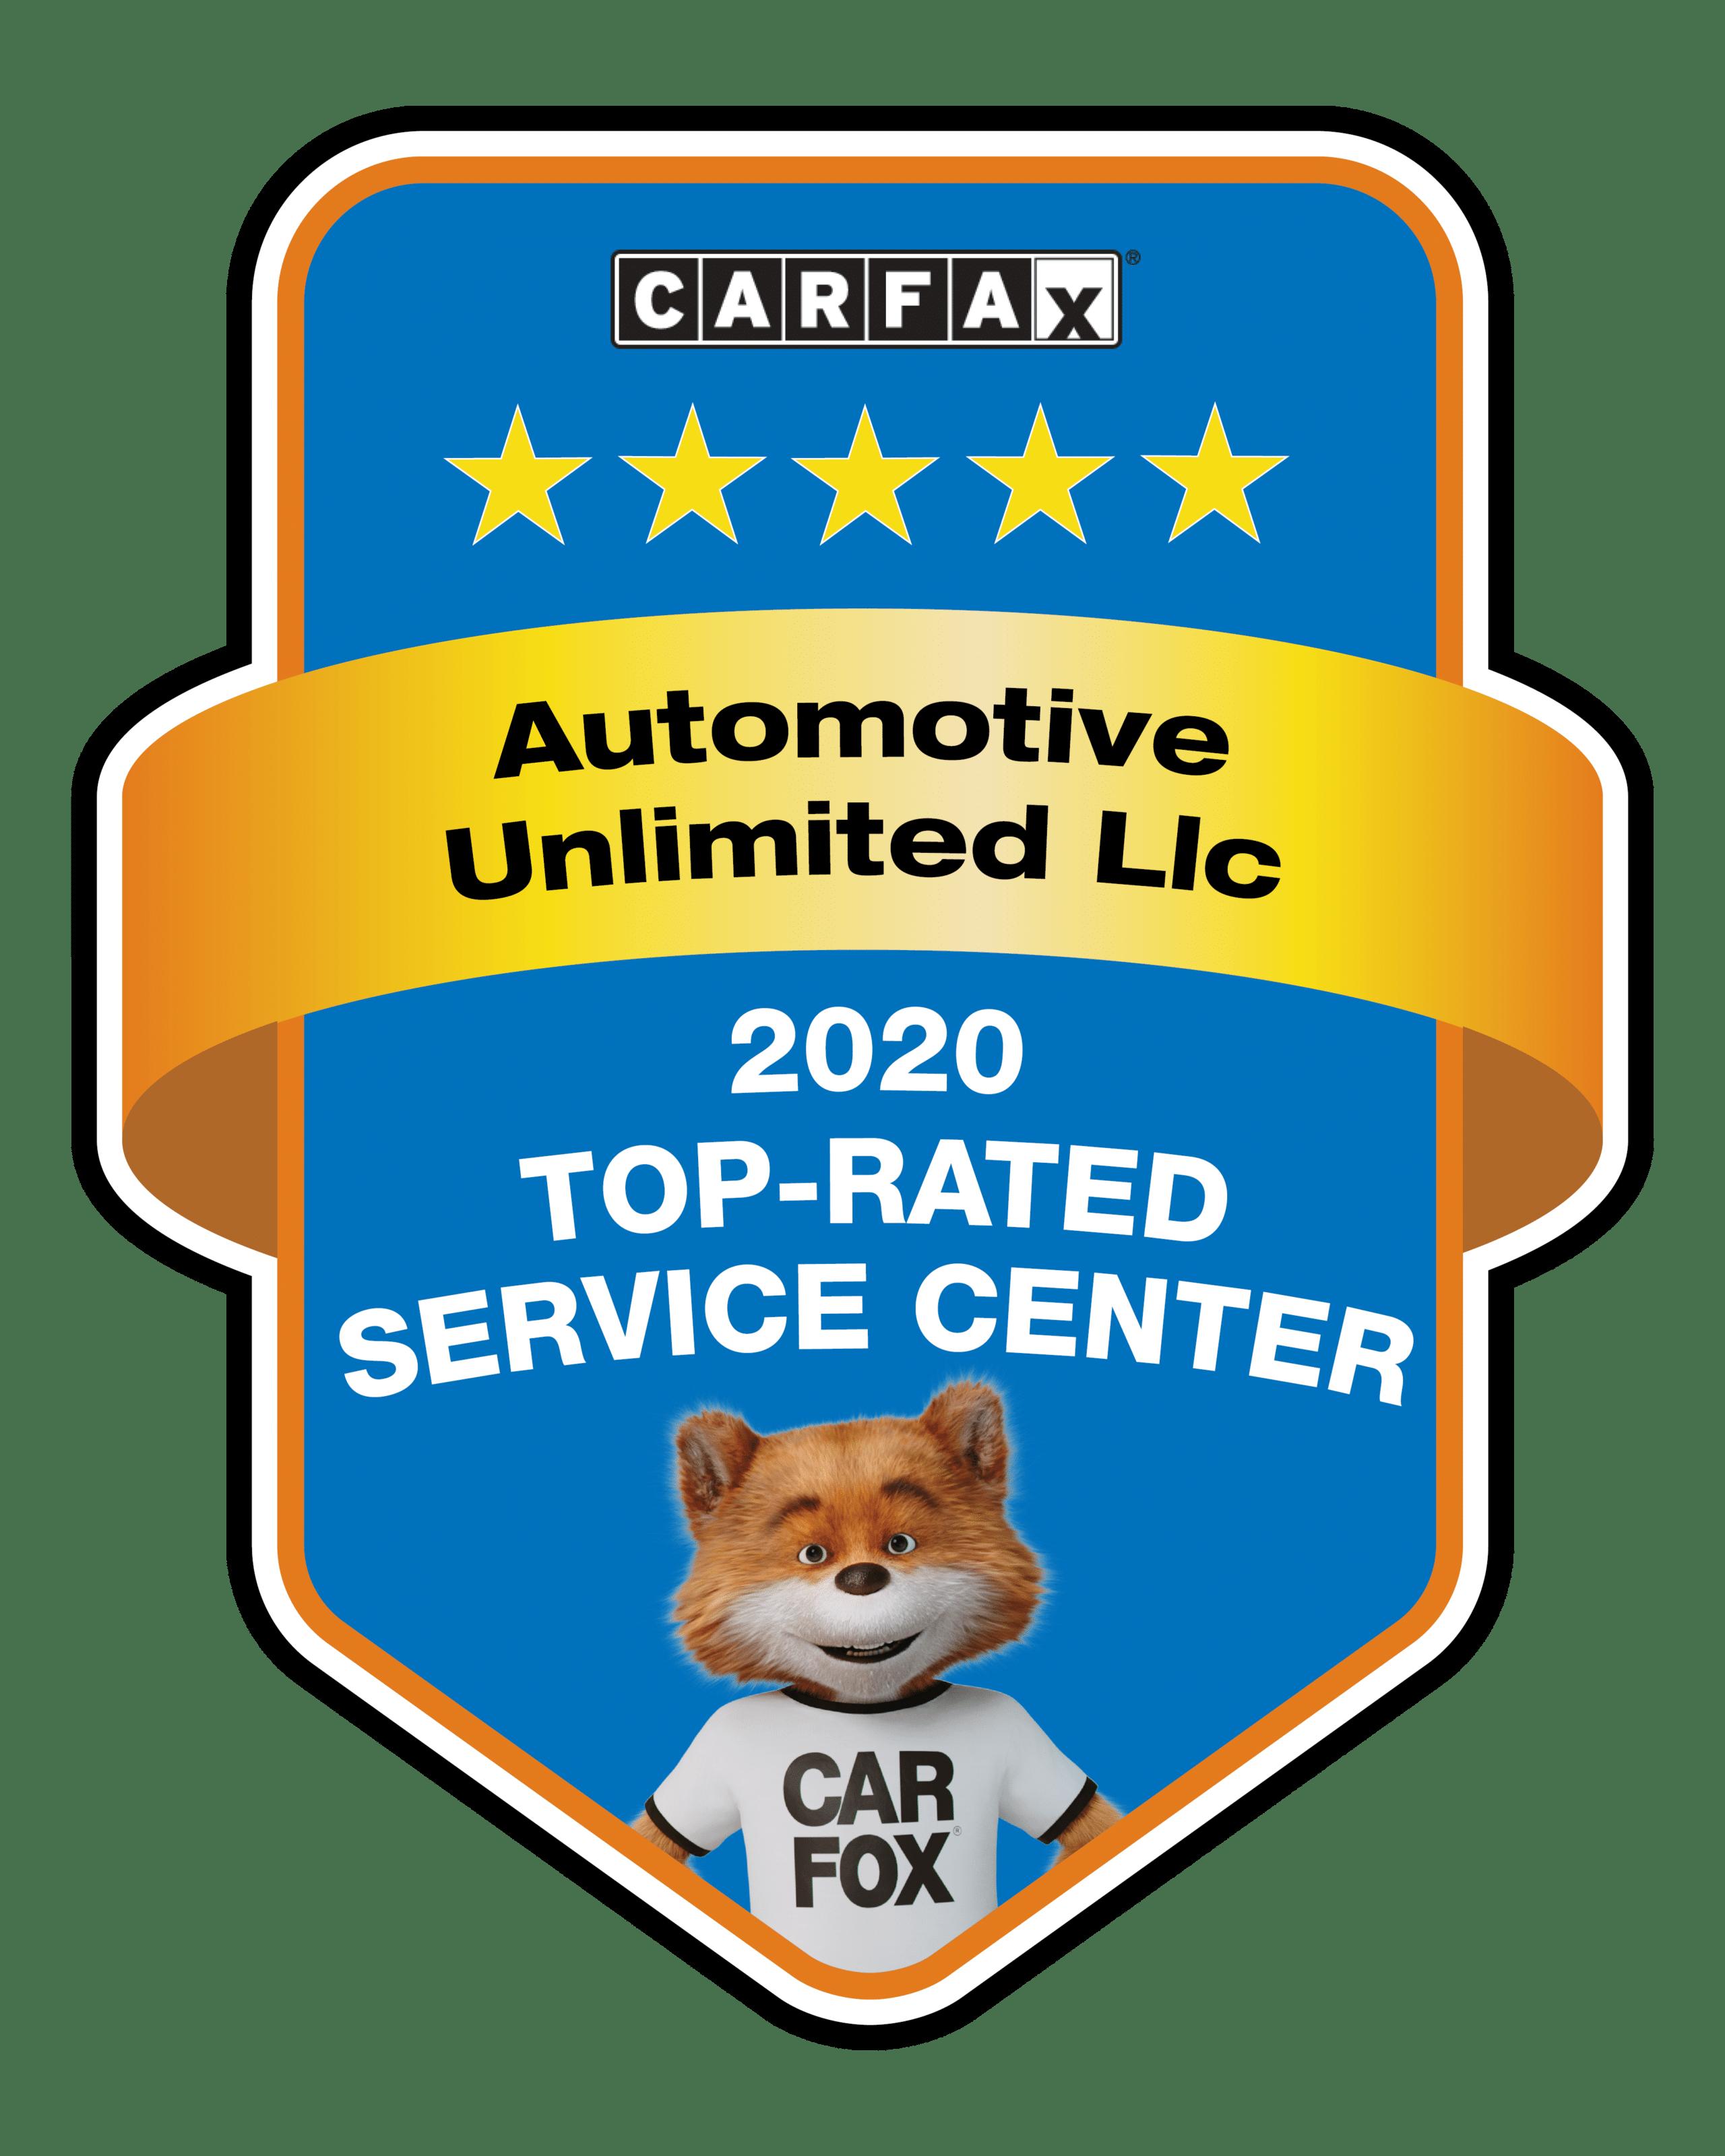 Carfax Automotive Repair Everett Snohomish County